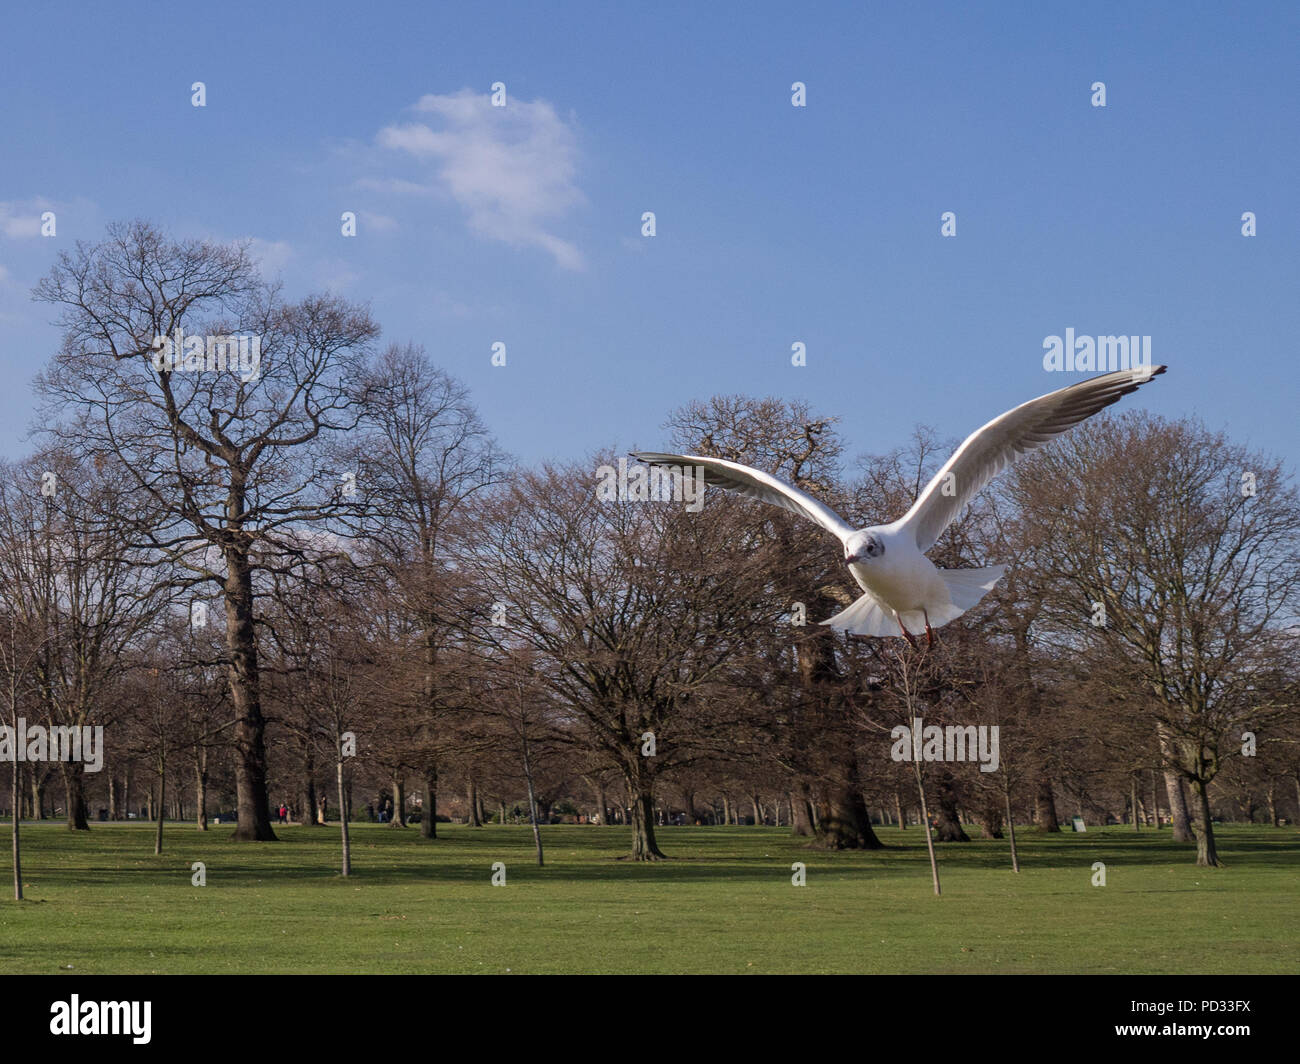 Street photography in London UK - Stock Image